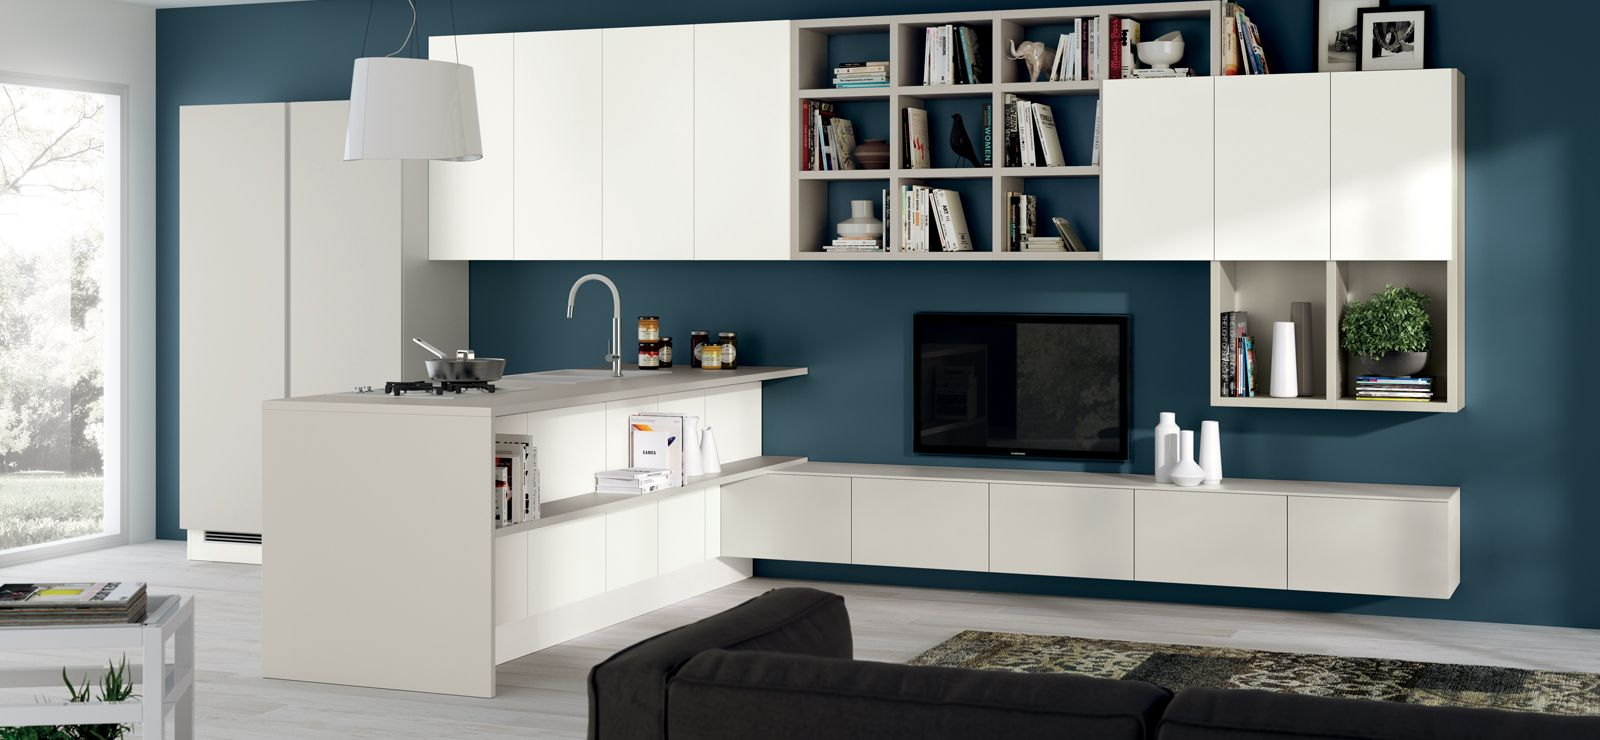 Living Scavolini | Living integrati con cucina | Pinterest ...